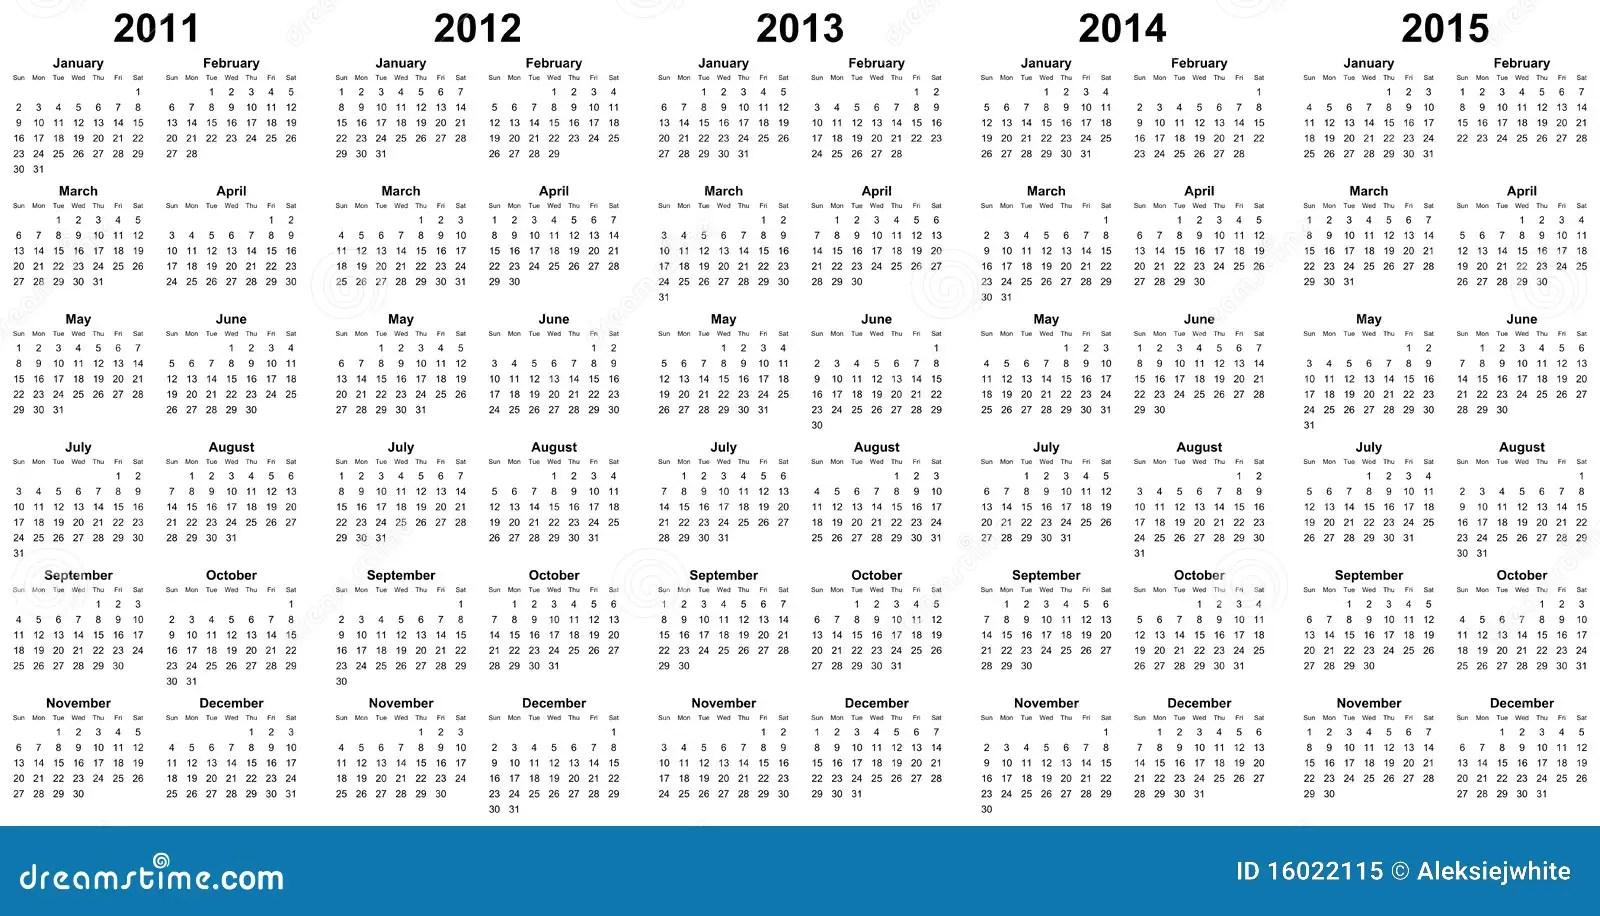 3 Year Calendar 2013 2014 2015